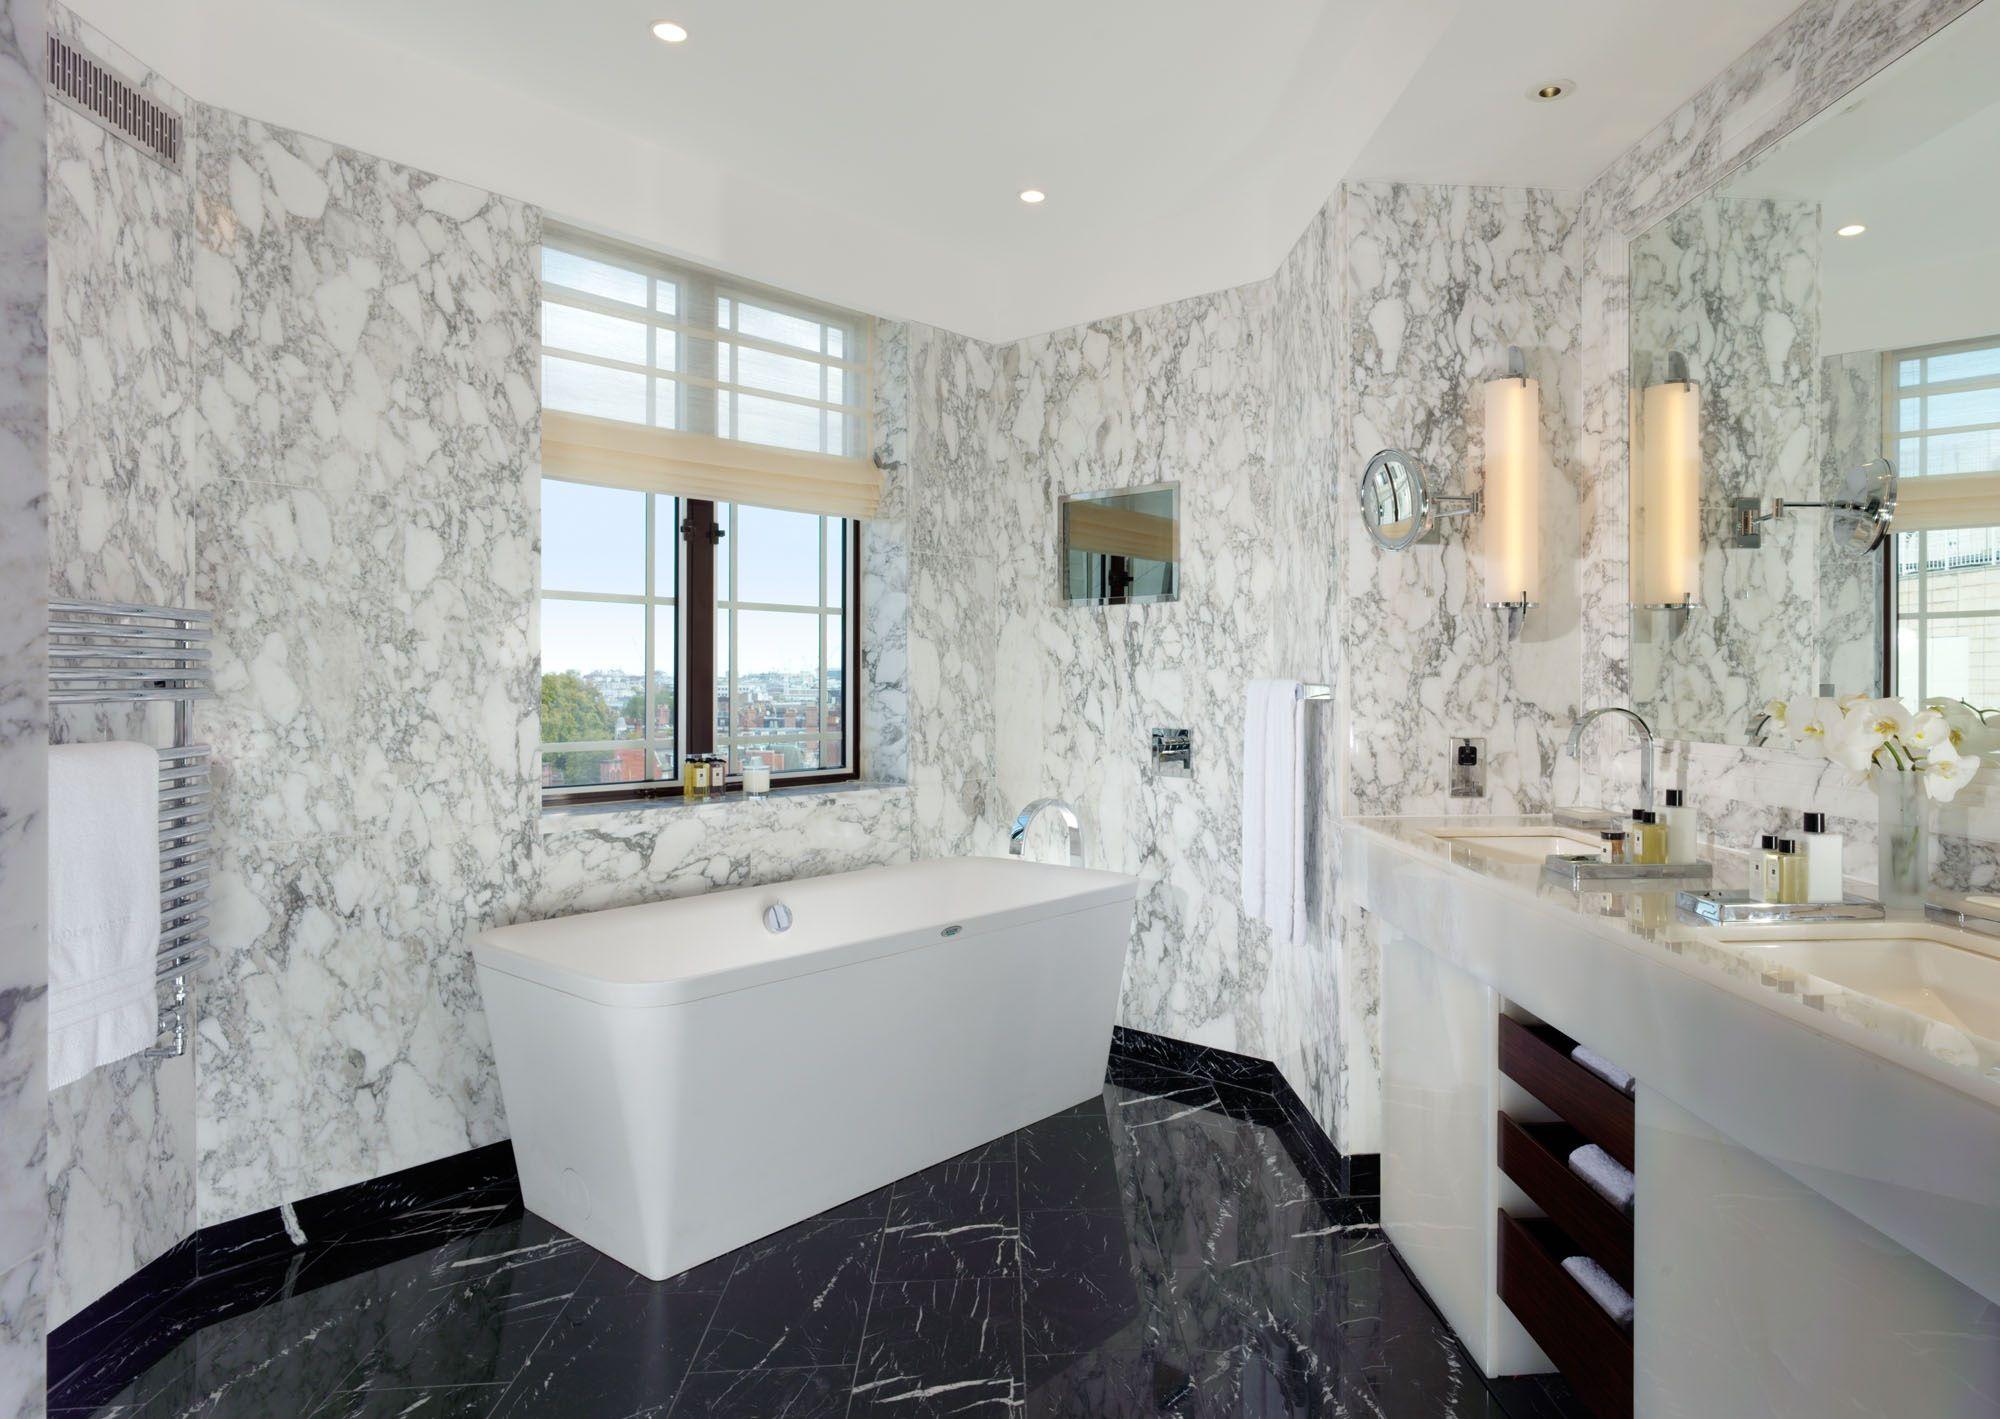 harlequin suite bathroom luxury hotel rooms suites london 5 star hotel the